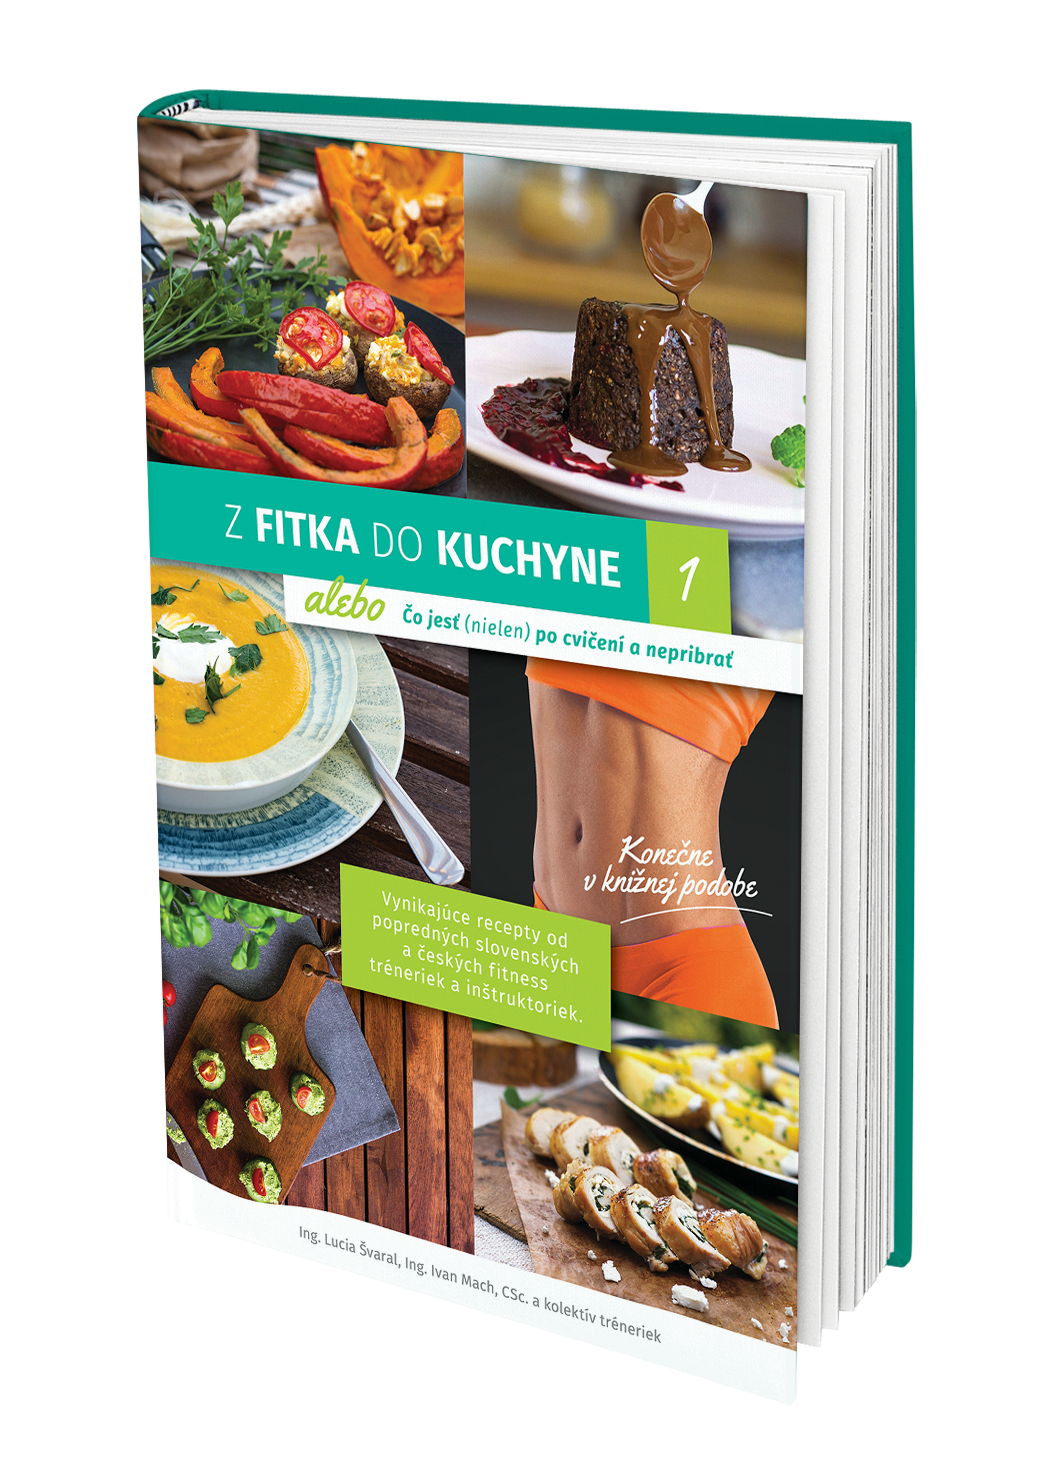 Z fitka do kuchyne 1 kuchárska kniha